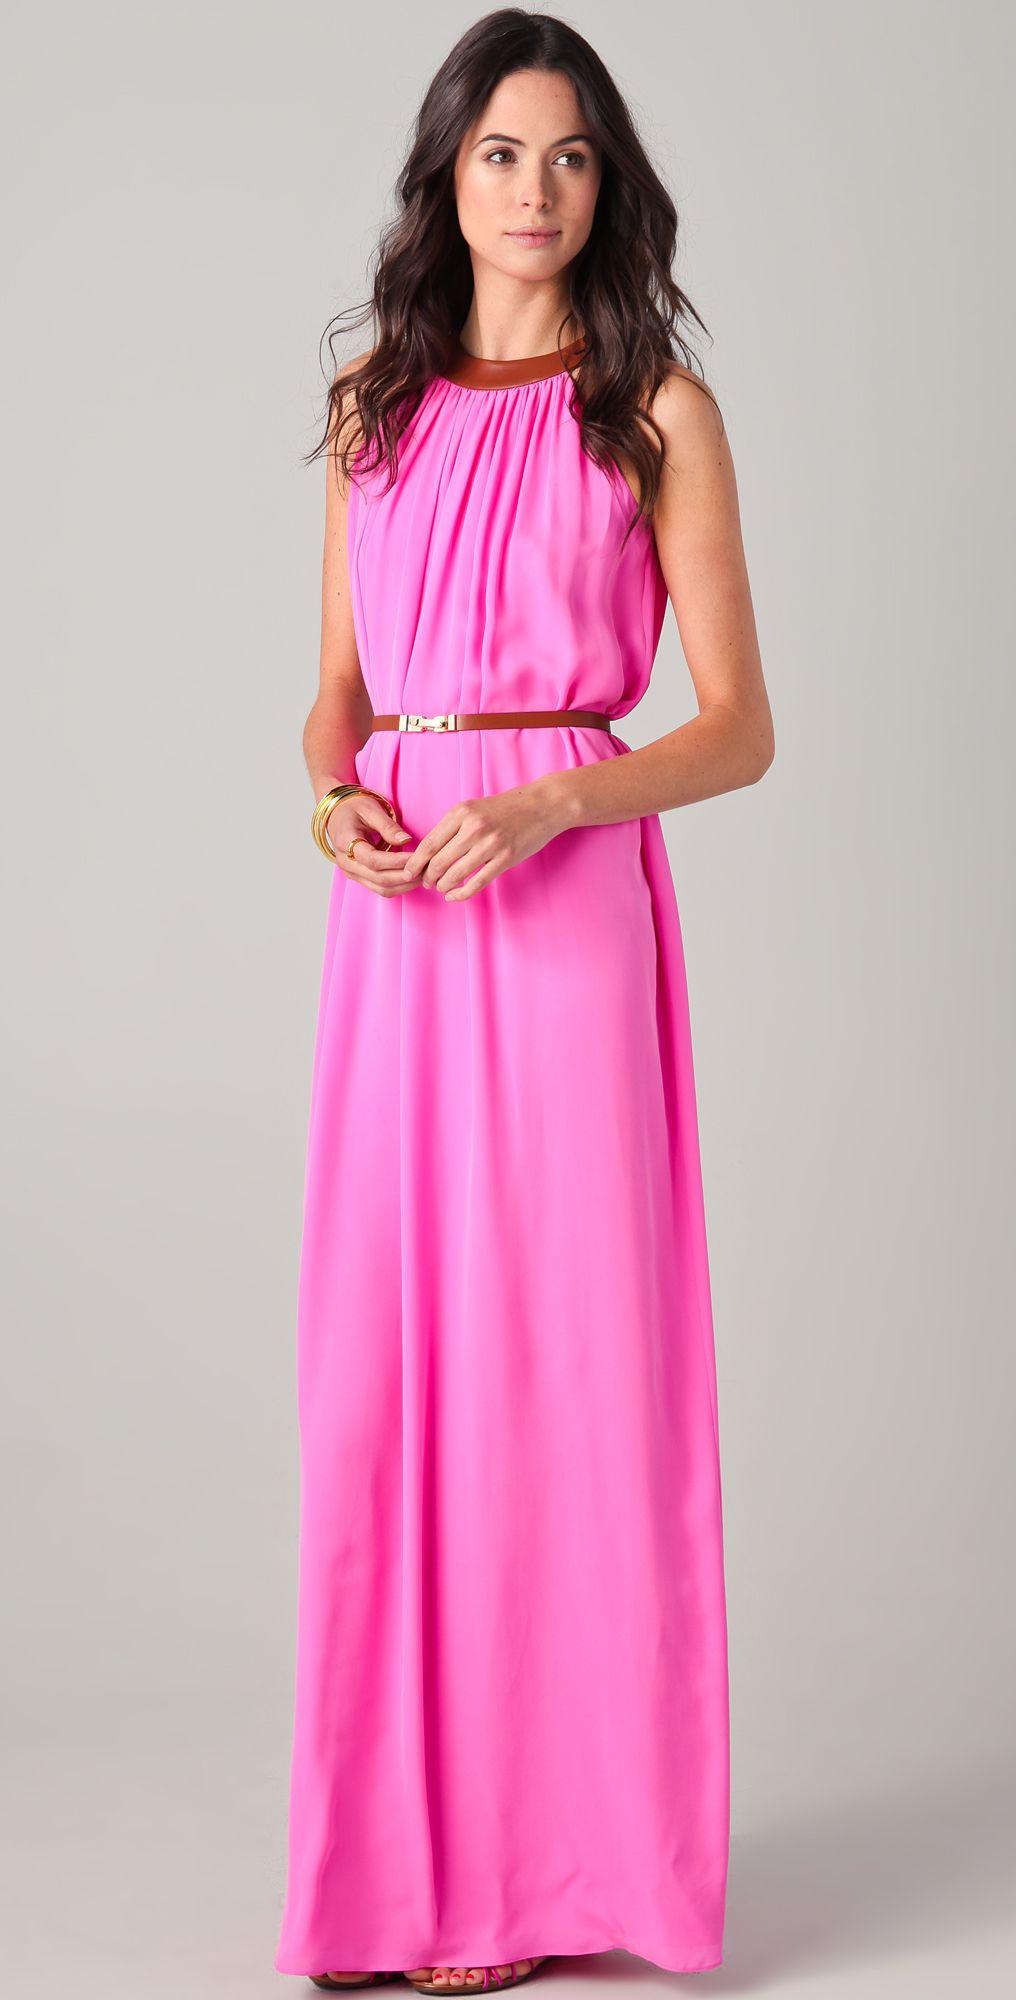 hot pink bridesmaid dress | Hmm ... What to wear | Pinterest | Hot ...